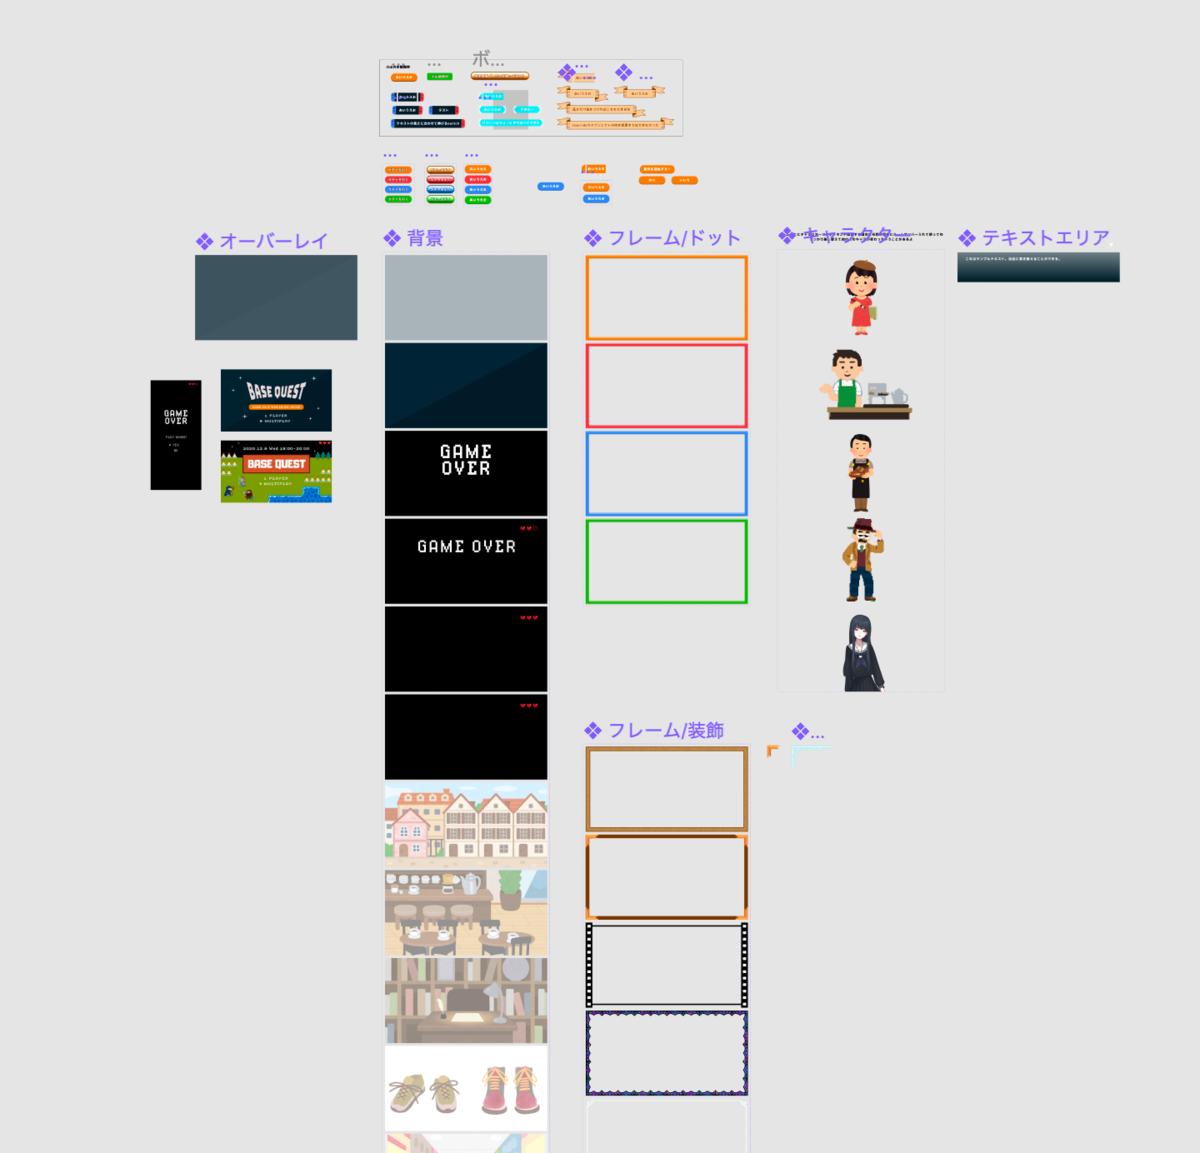 f:id:fukiworks:20201224202805p:plain